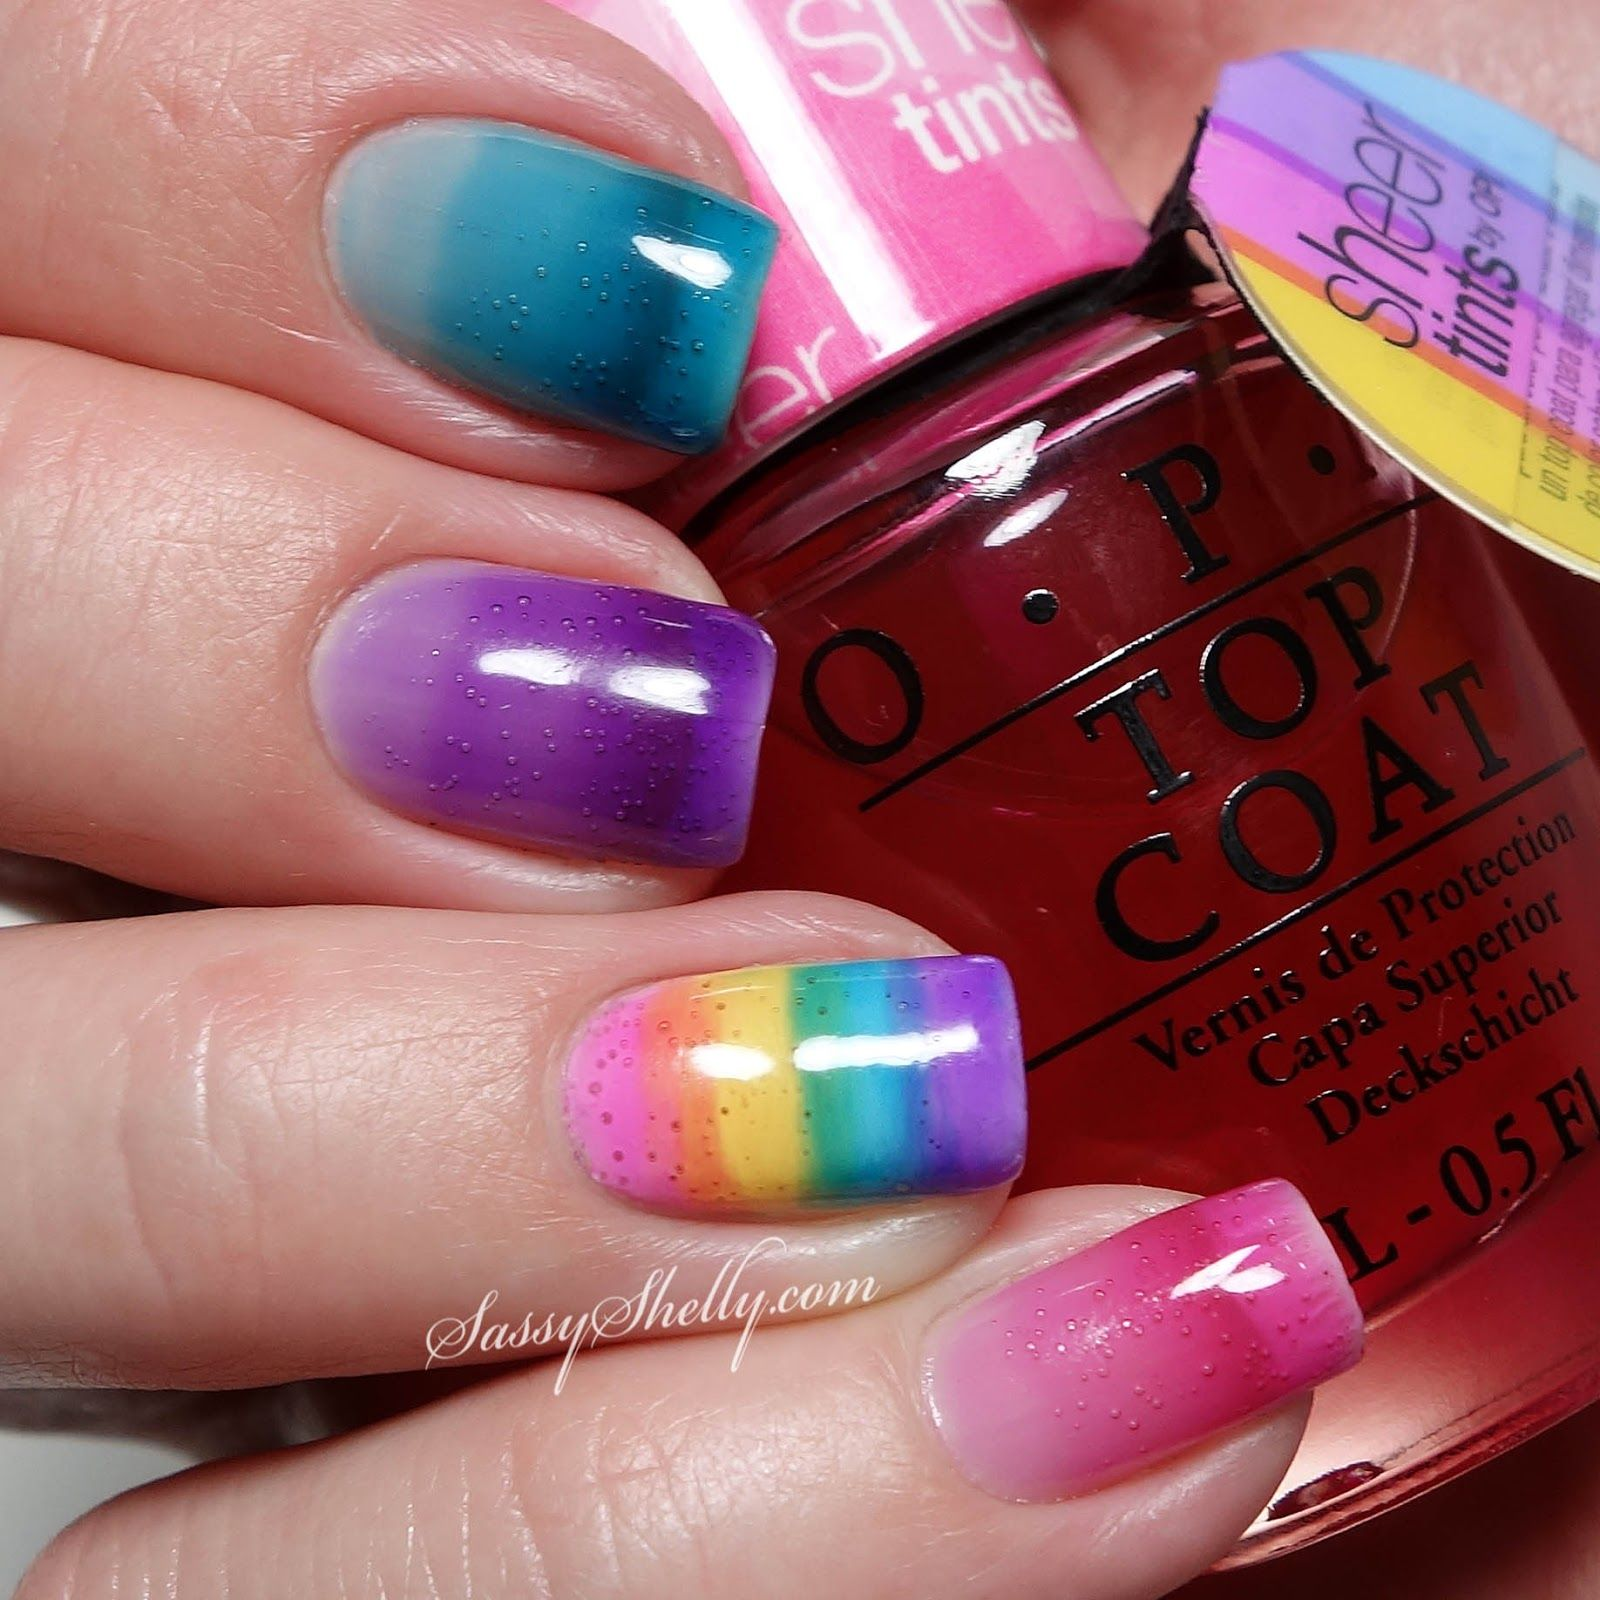 Photo of OPI Sheer Tints ~ Syrup Mani and Layered Rainbow accent nail | Sassy Shelly